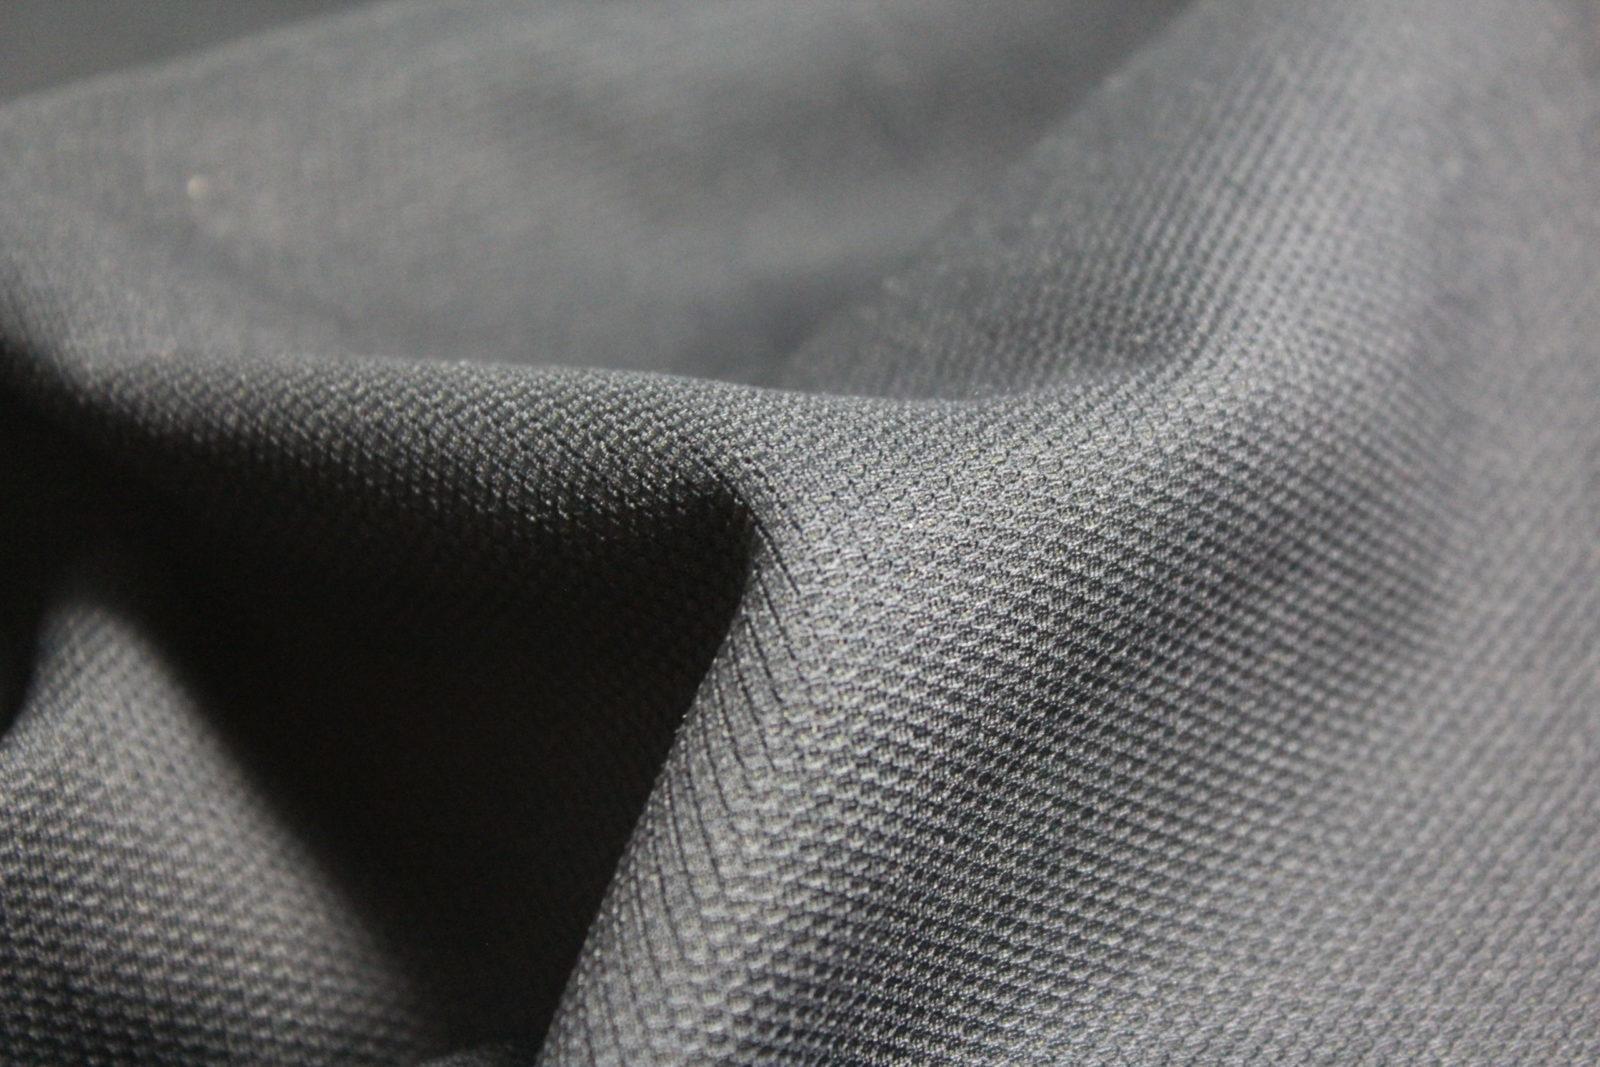 Sharkskin Chillproof Titanium Fabric